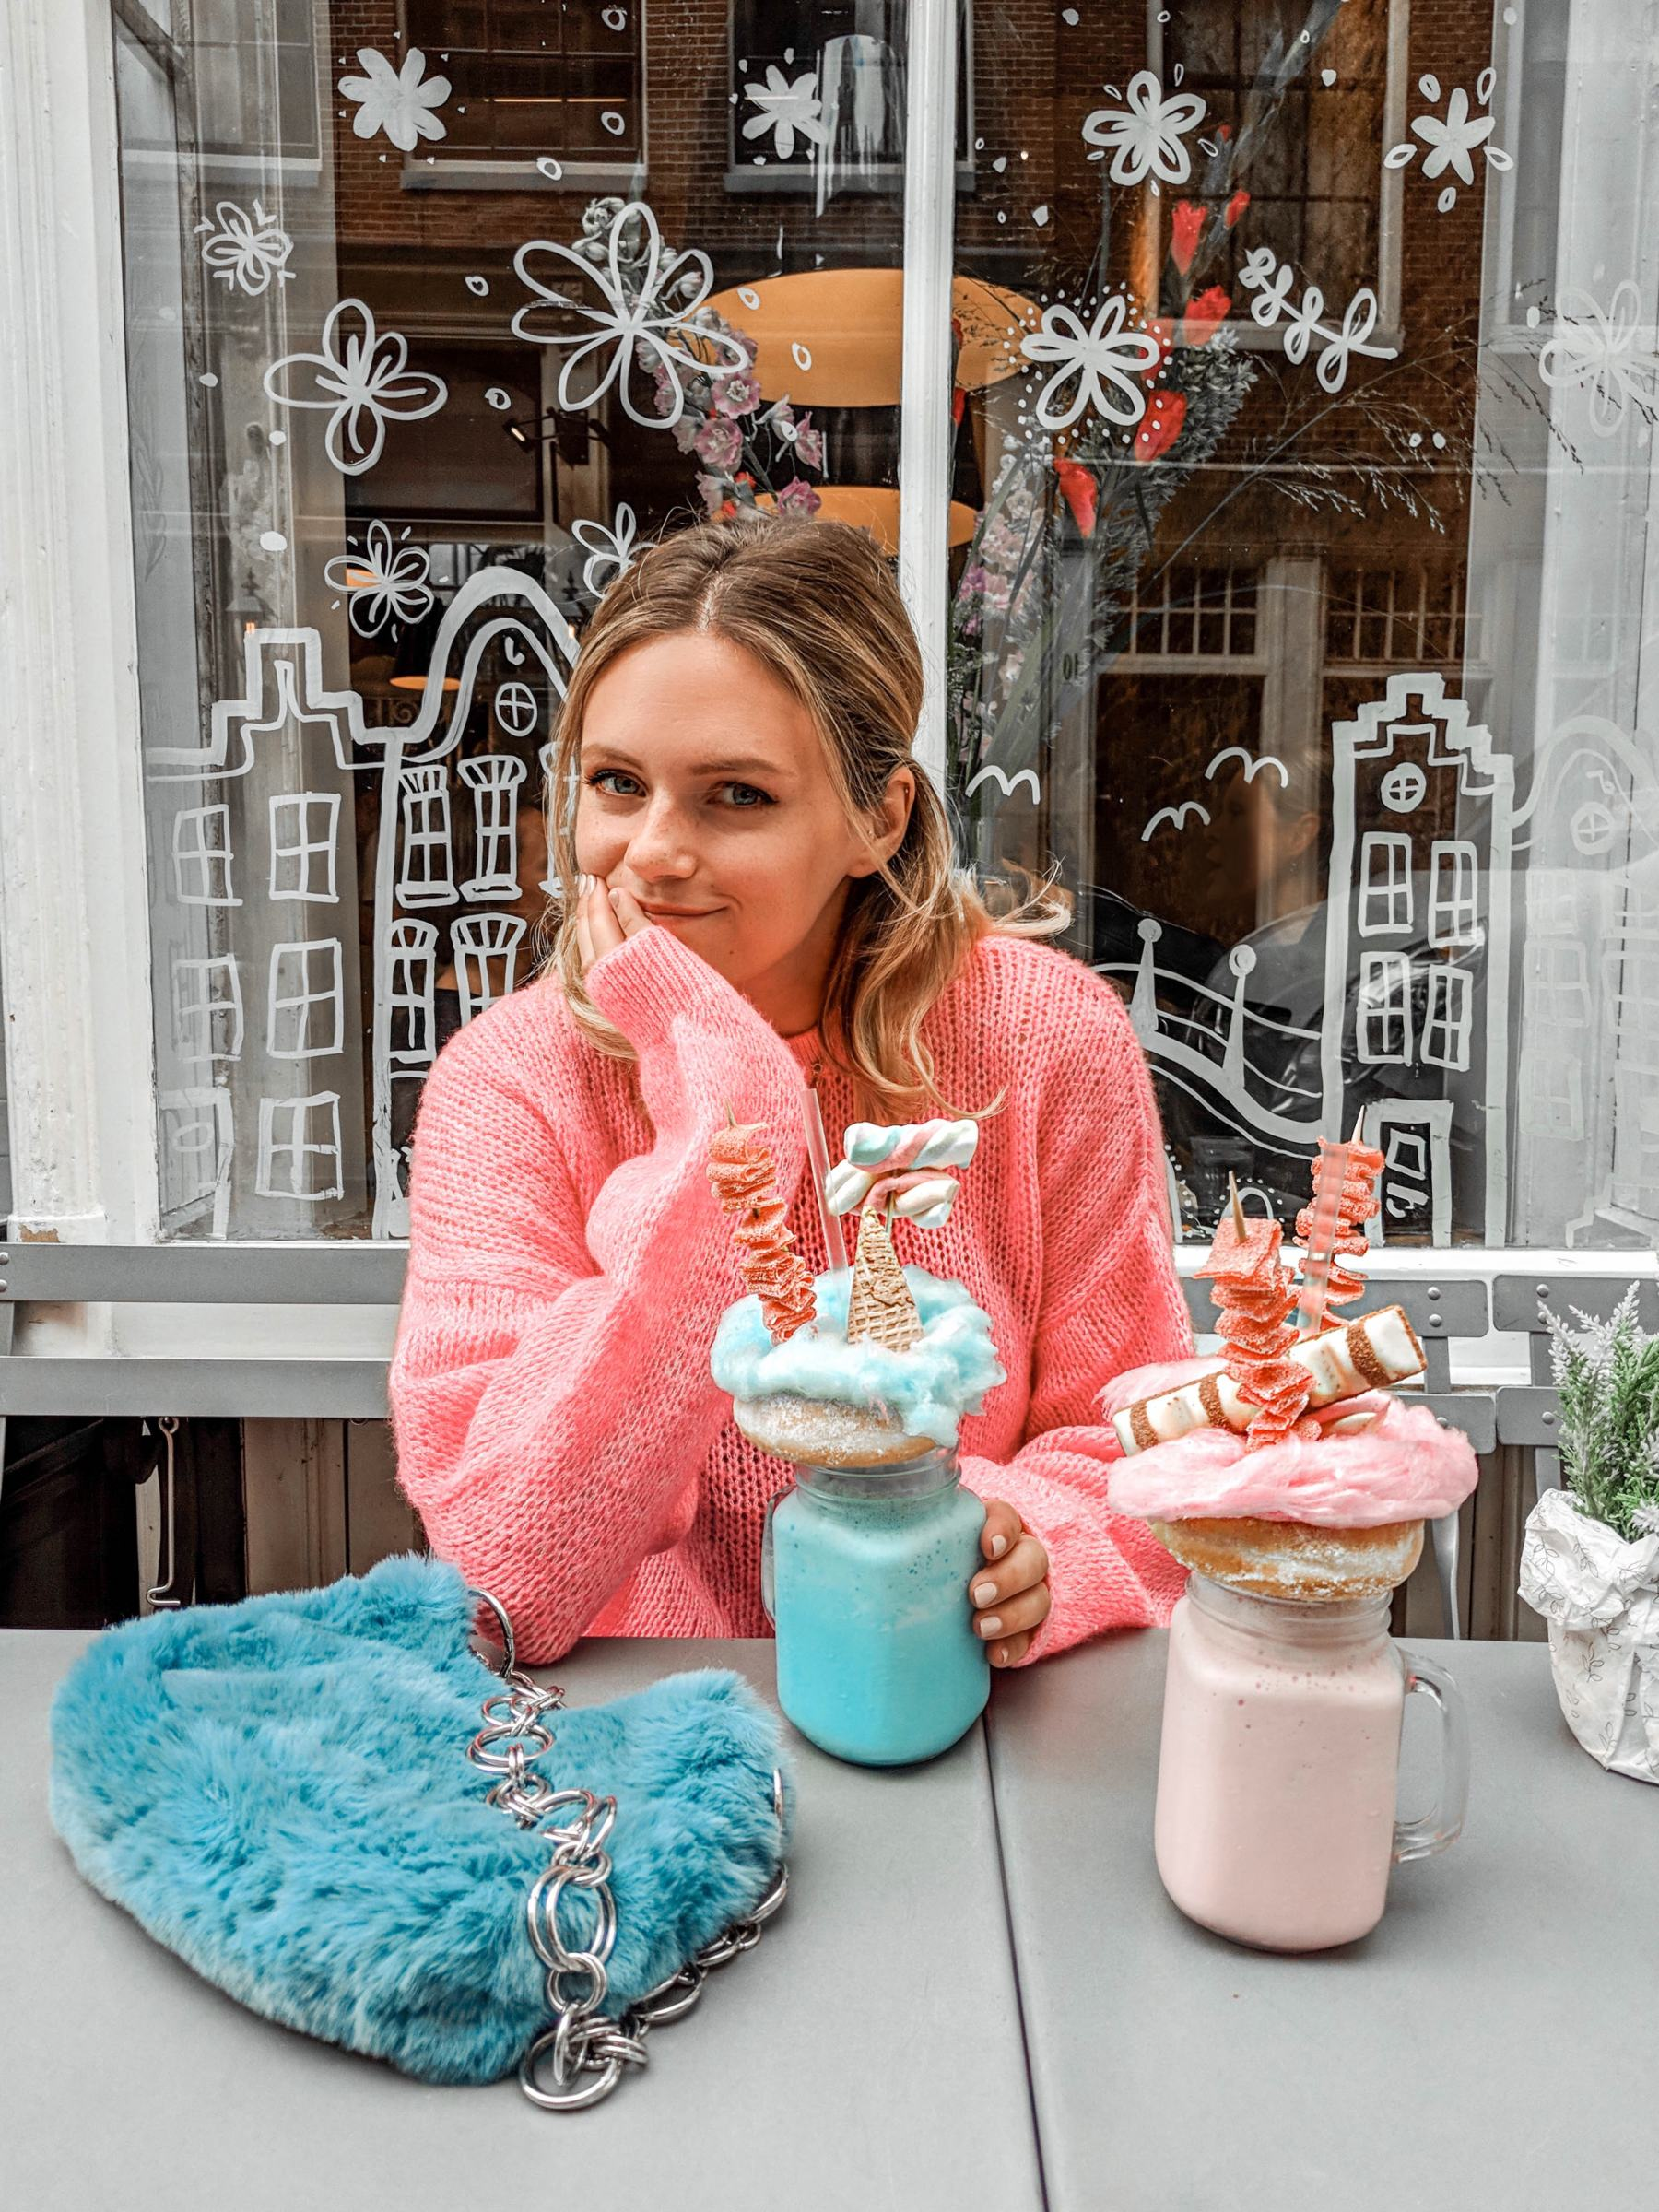 cocoa chelsea jesschamilton instagram shop my outfits liketoknowit